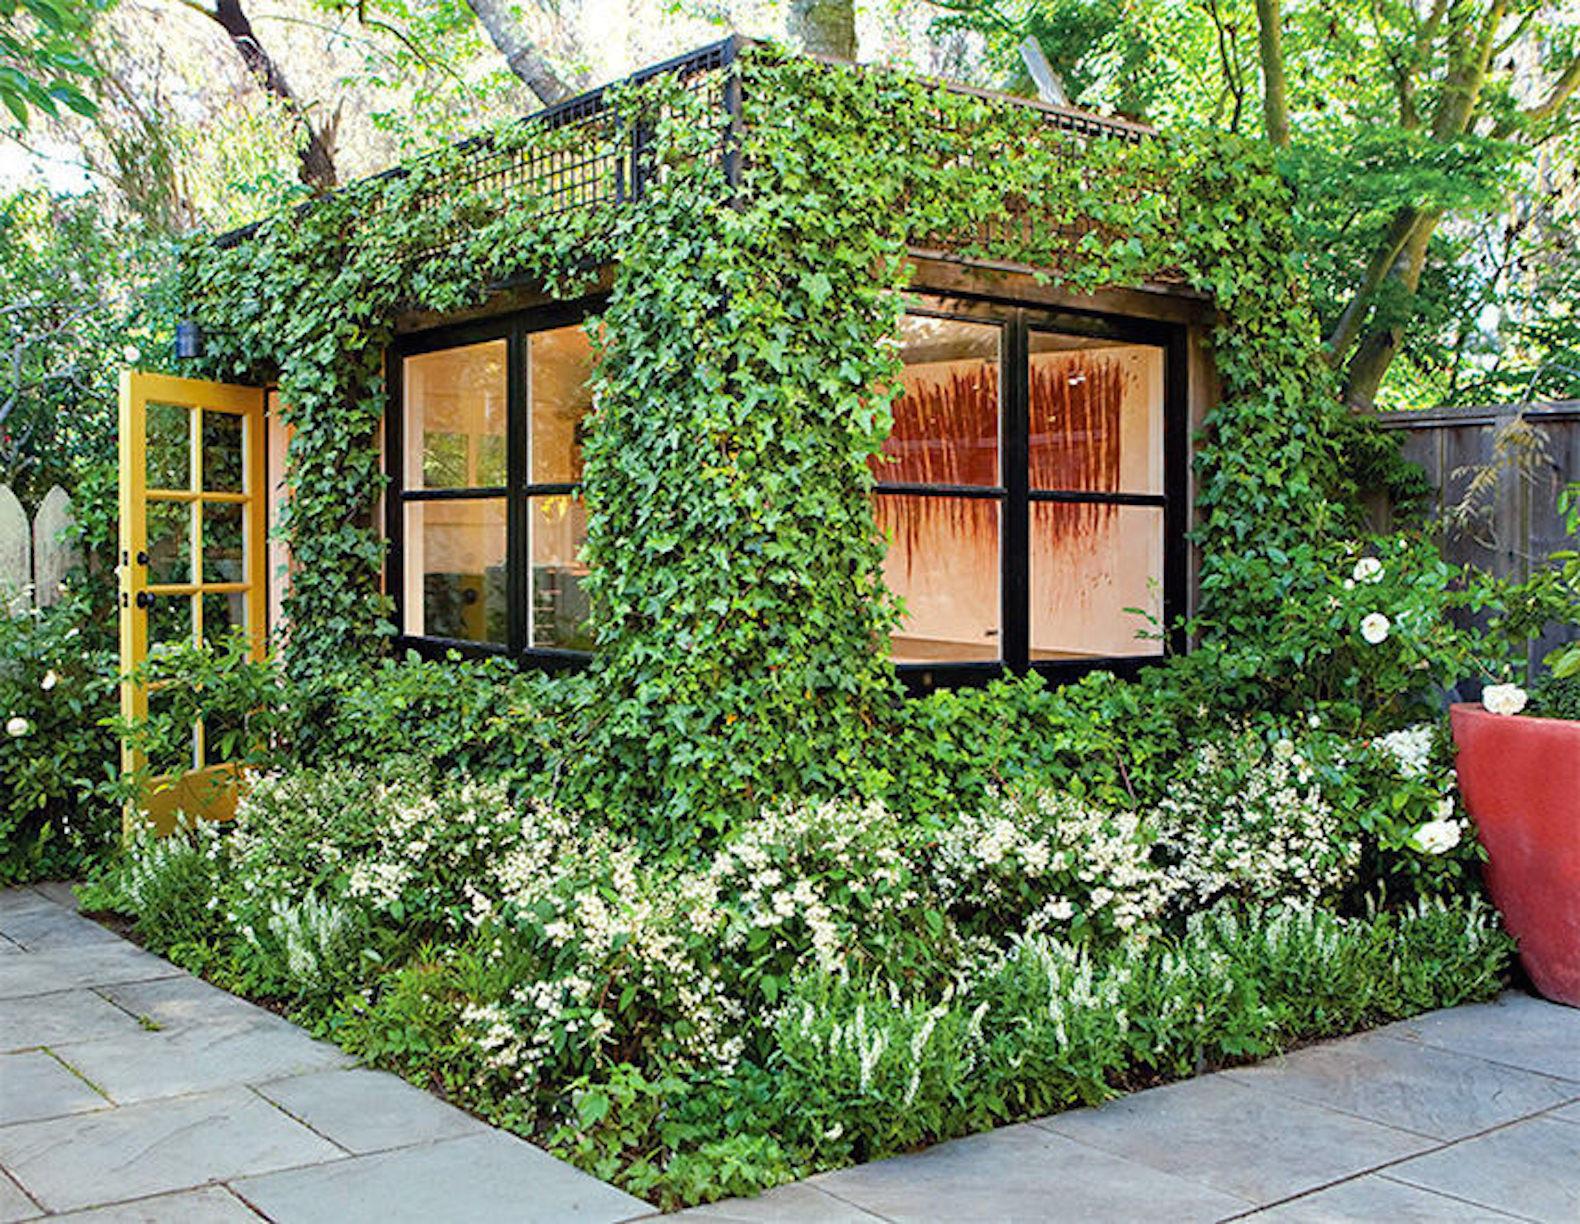 This Lush Green Backyard Office Is A Dream Artist S